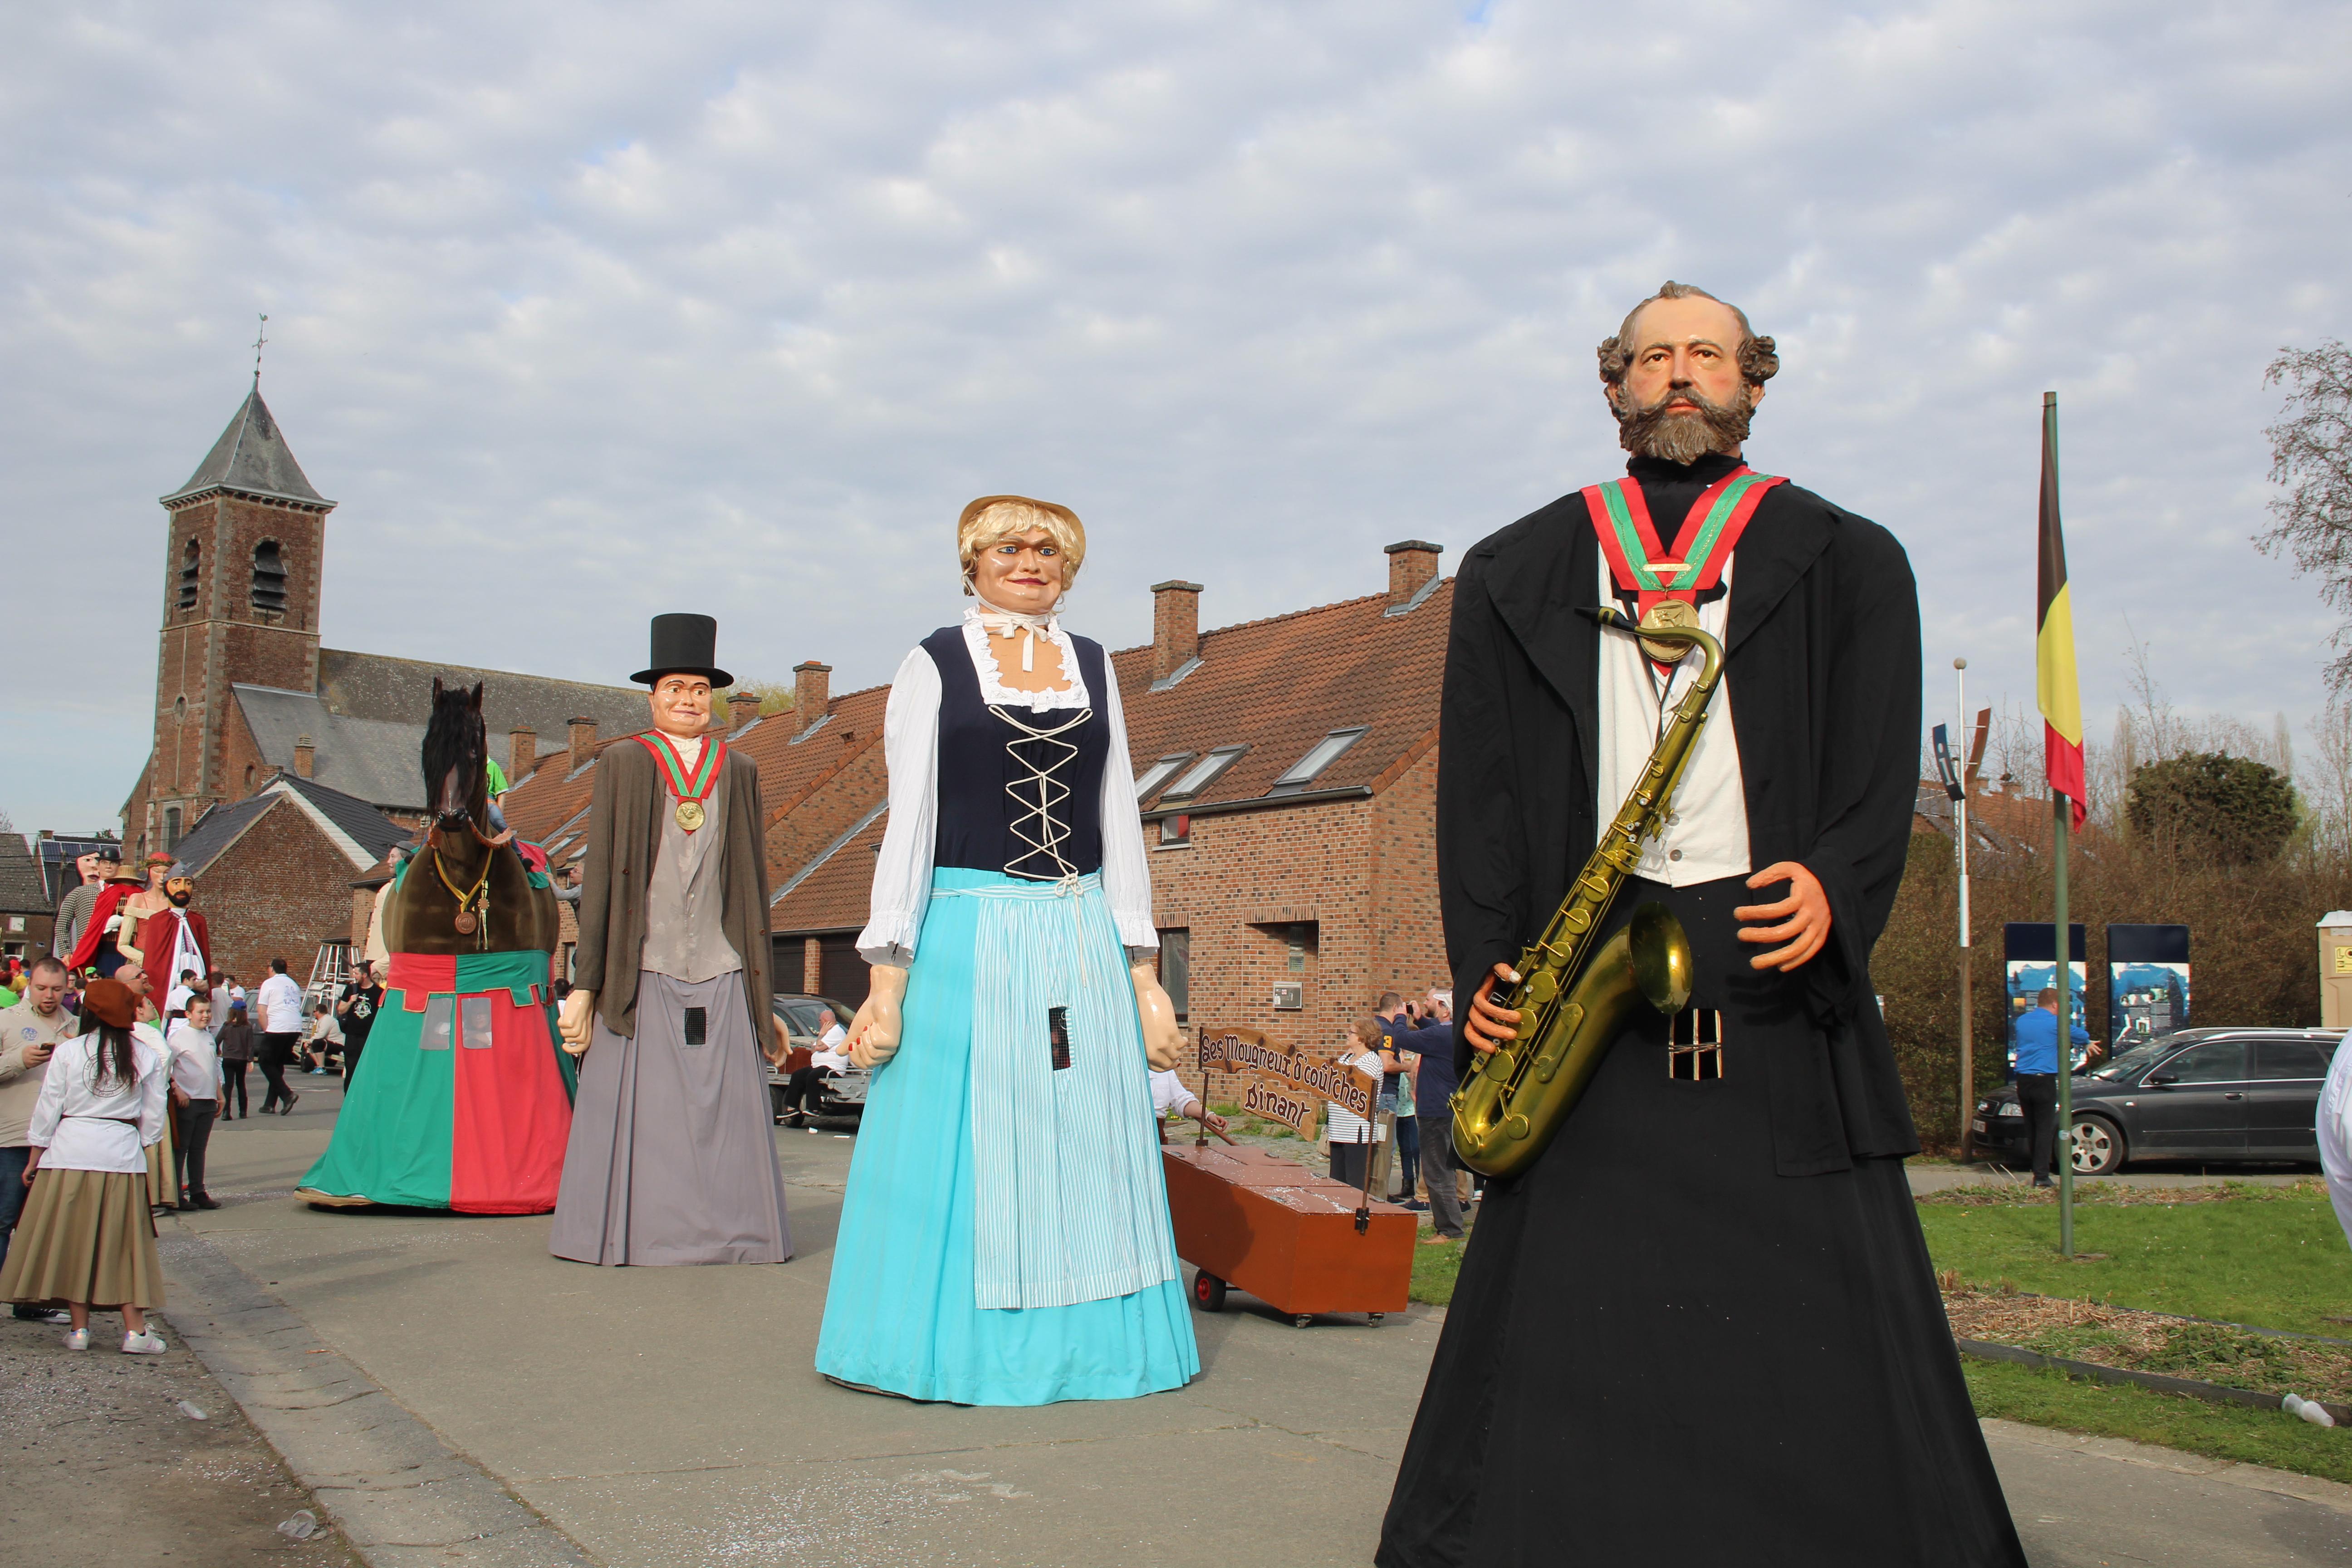 Carnaval de Dinant